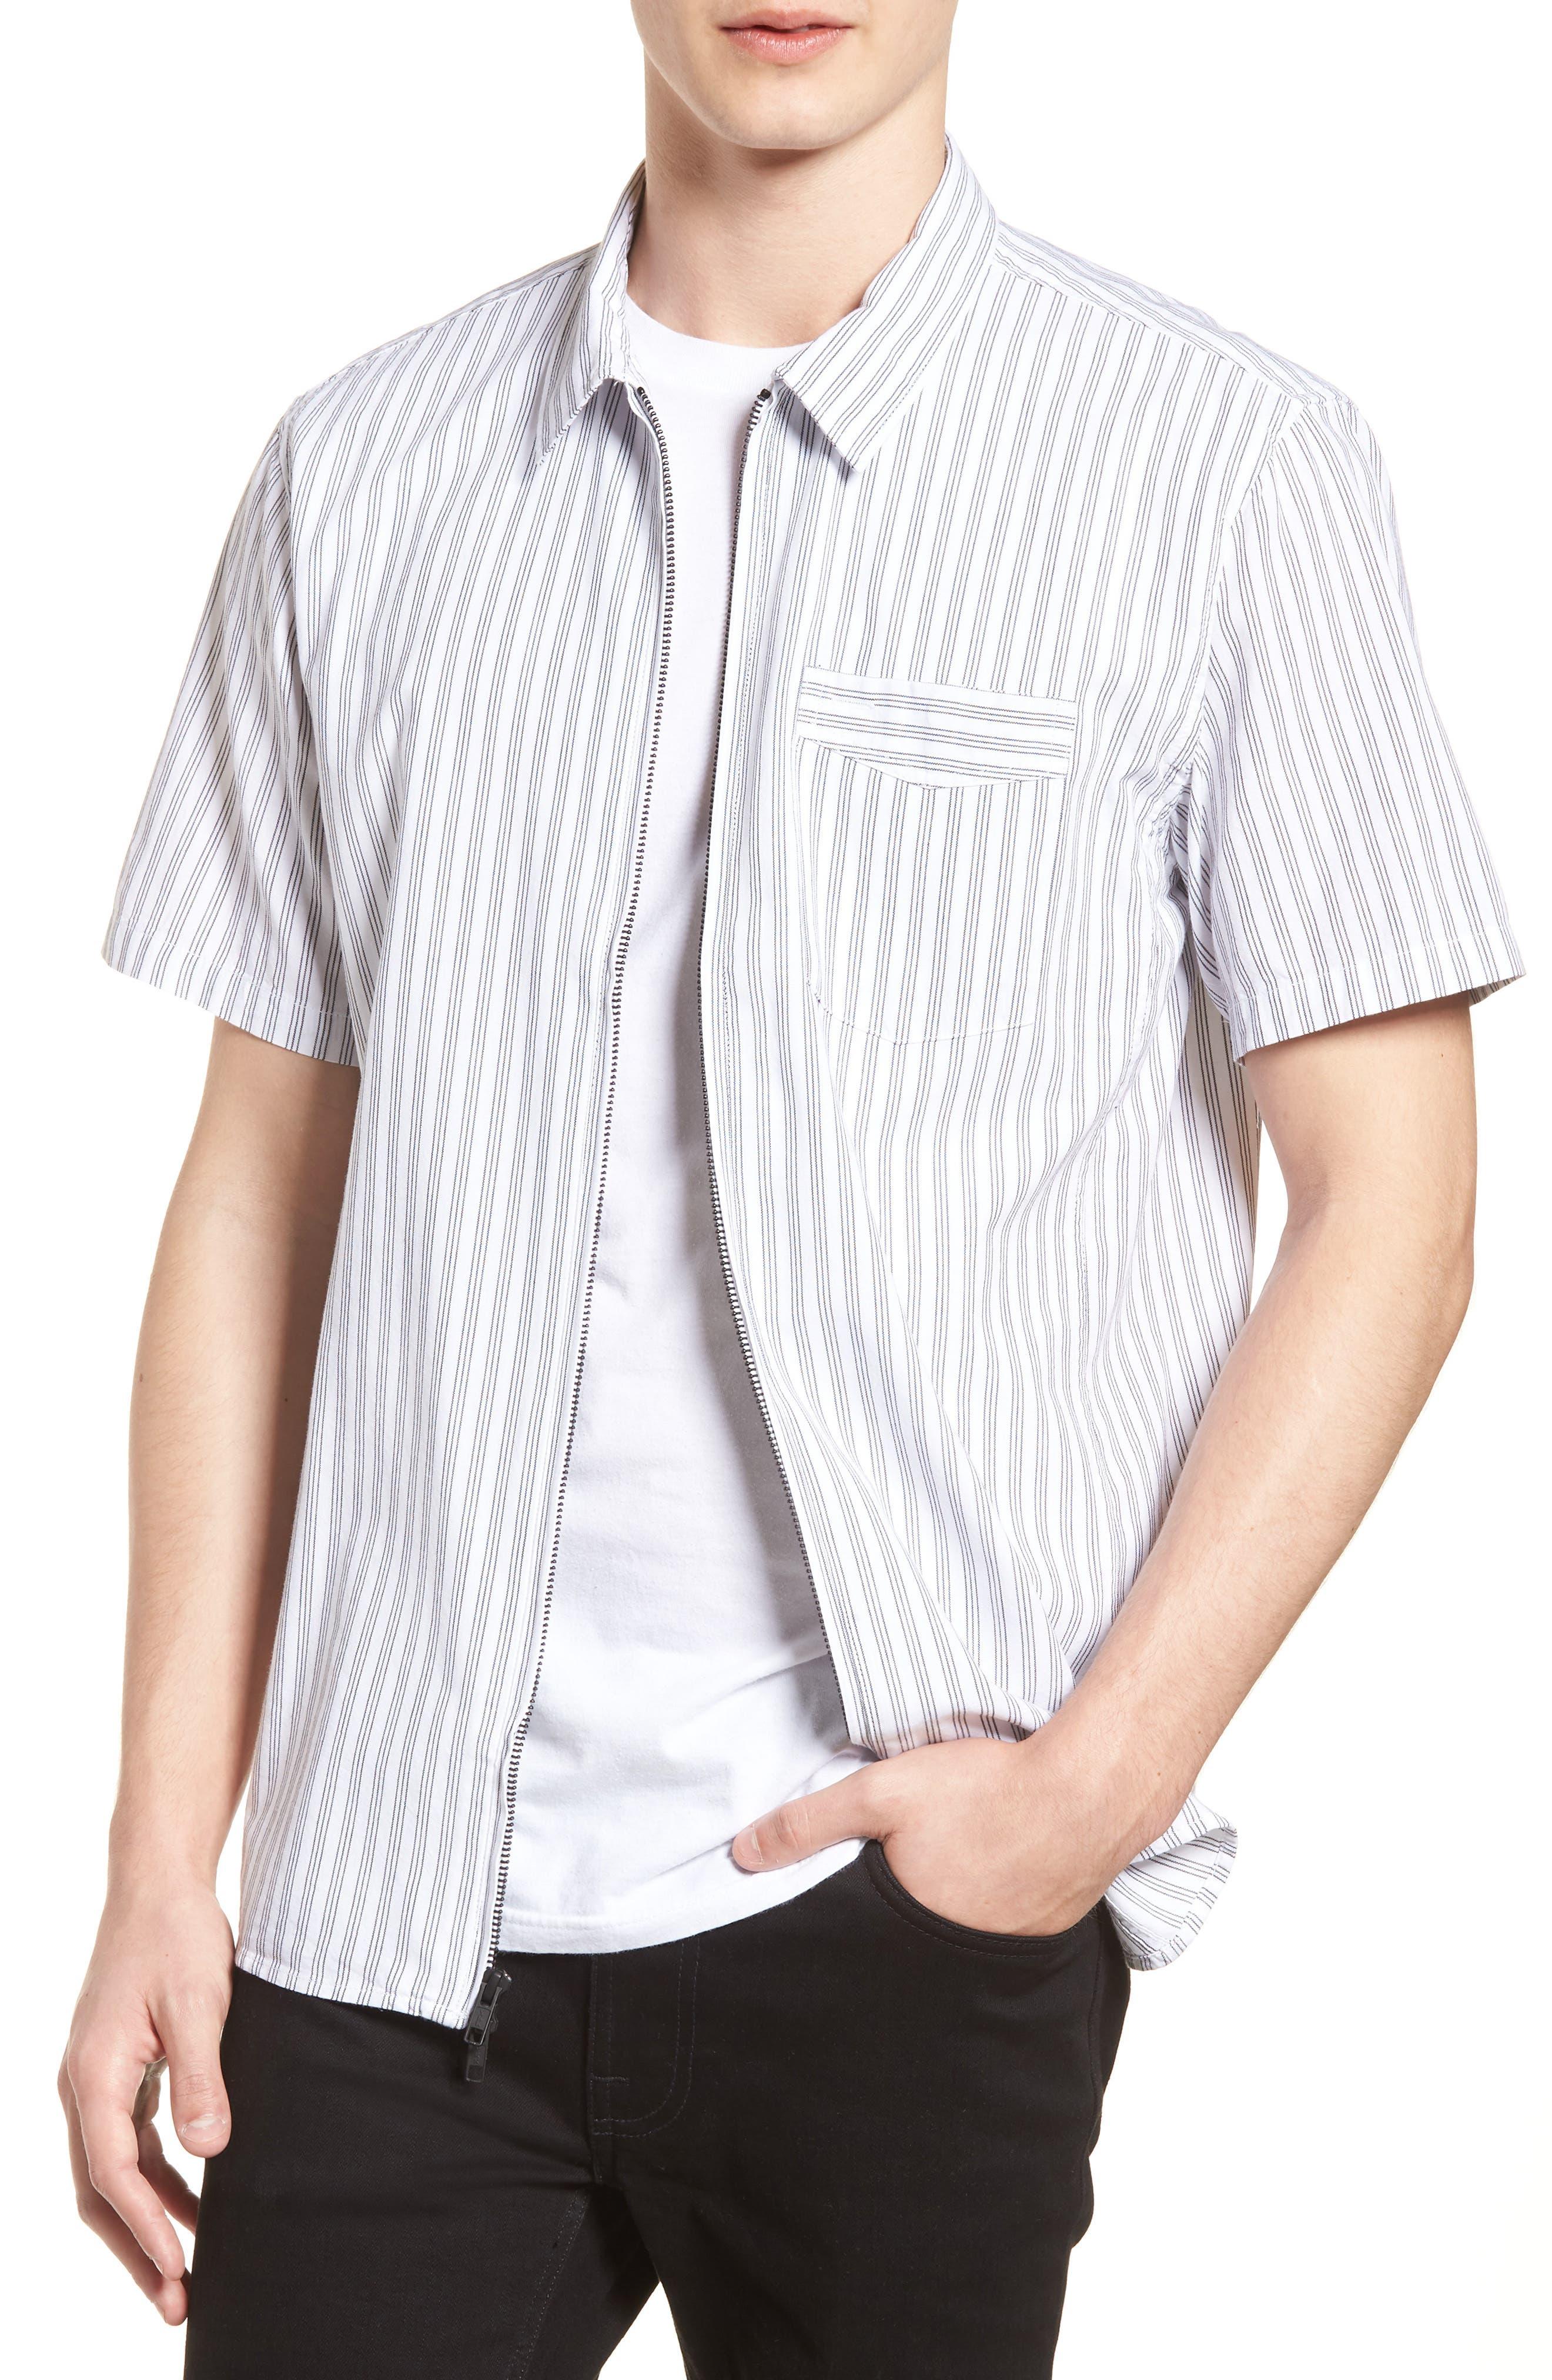 Rollins Woven Shirt,                             Alternate thumbnail 4, color,                             Black/White Stripe